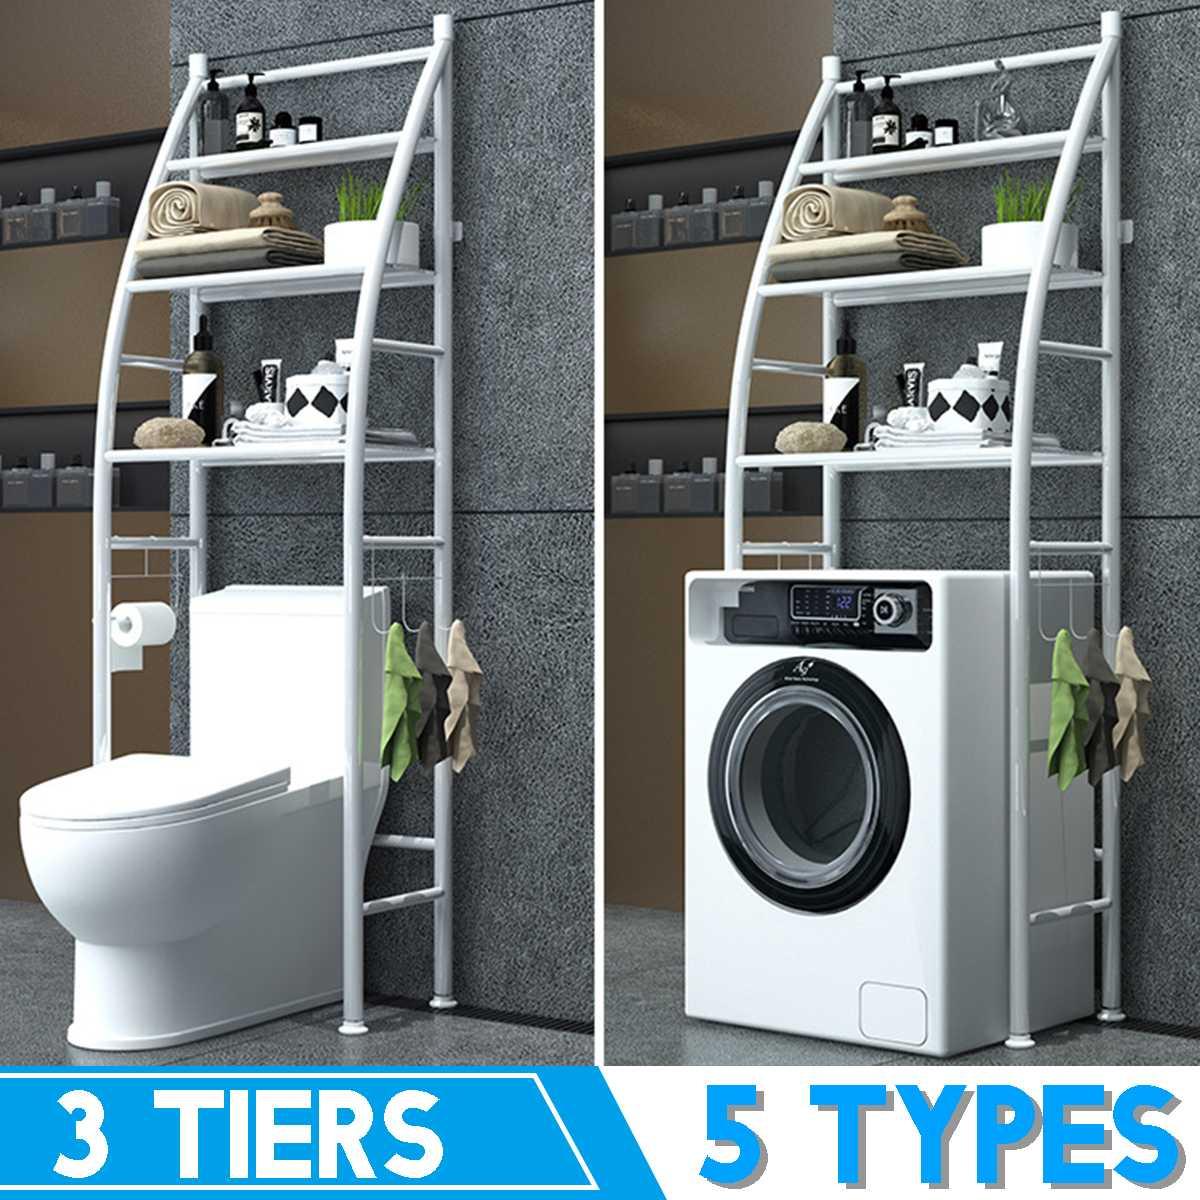 5 Types Over The Rack Metal Toilet Cabinet Shelving Kitchen Washing Machine Rack Bathroom Space Saver Shelf Organizer Holder New